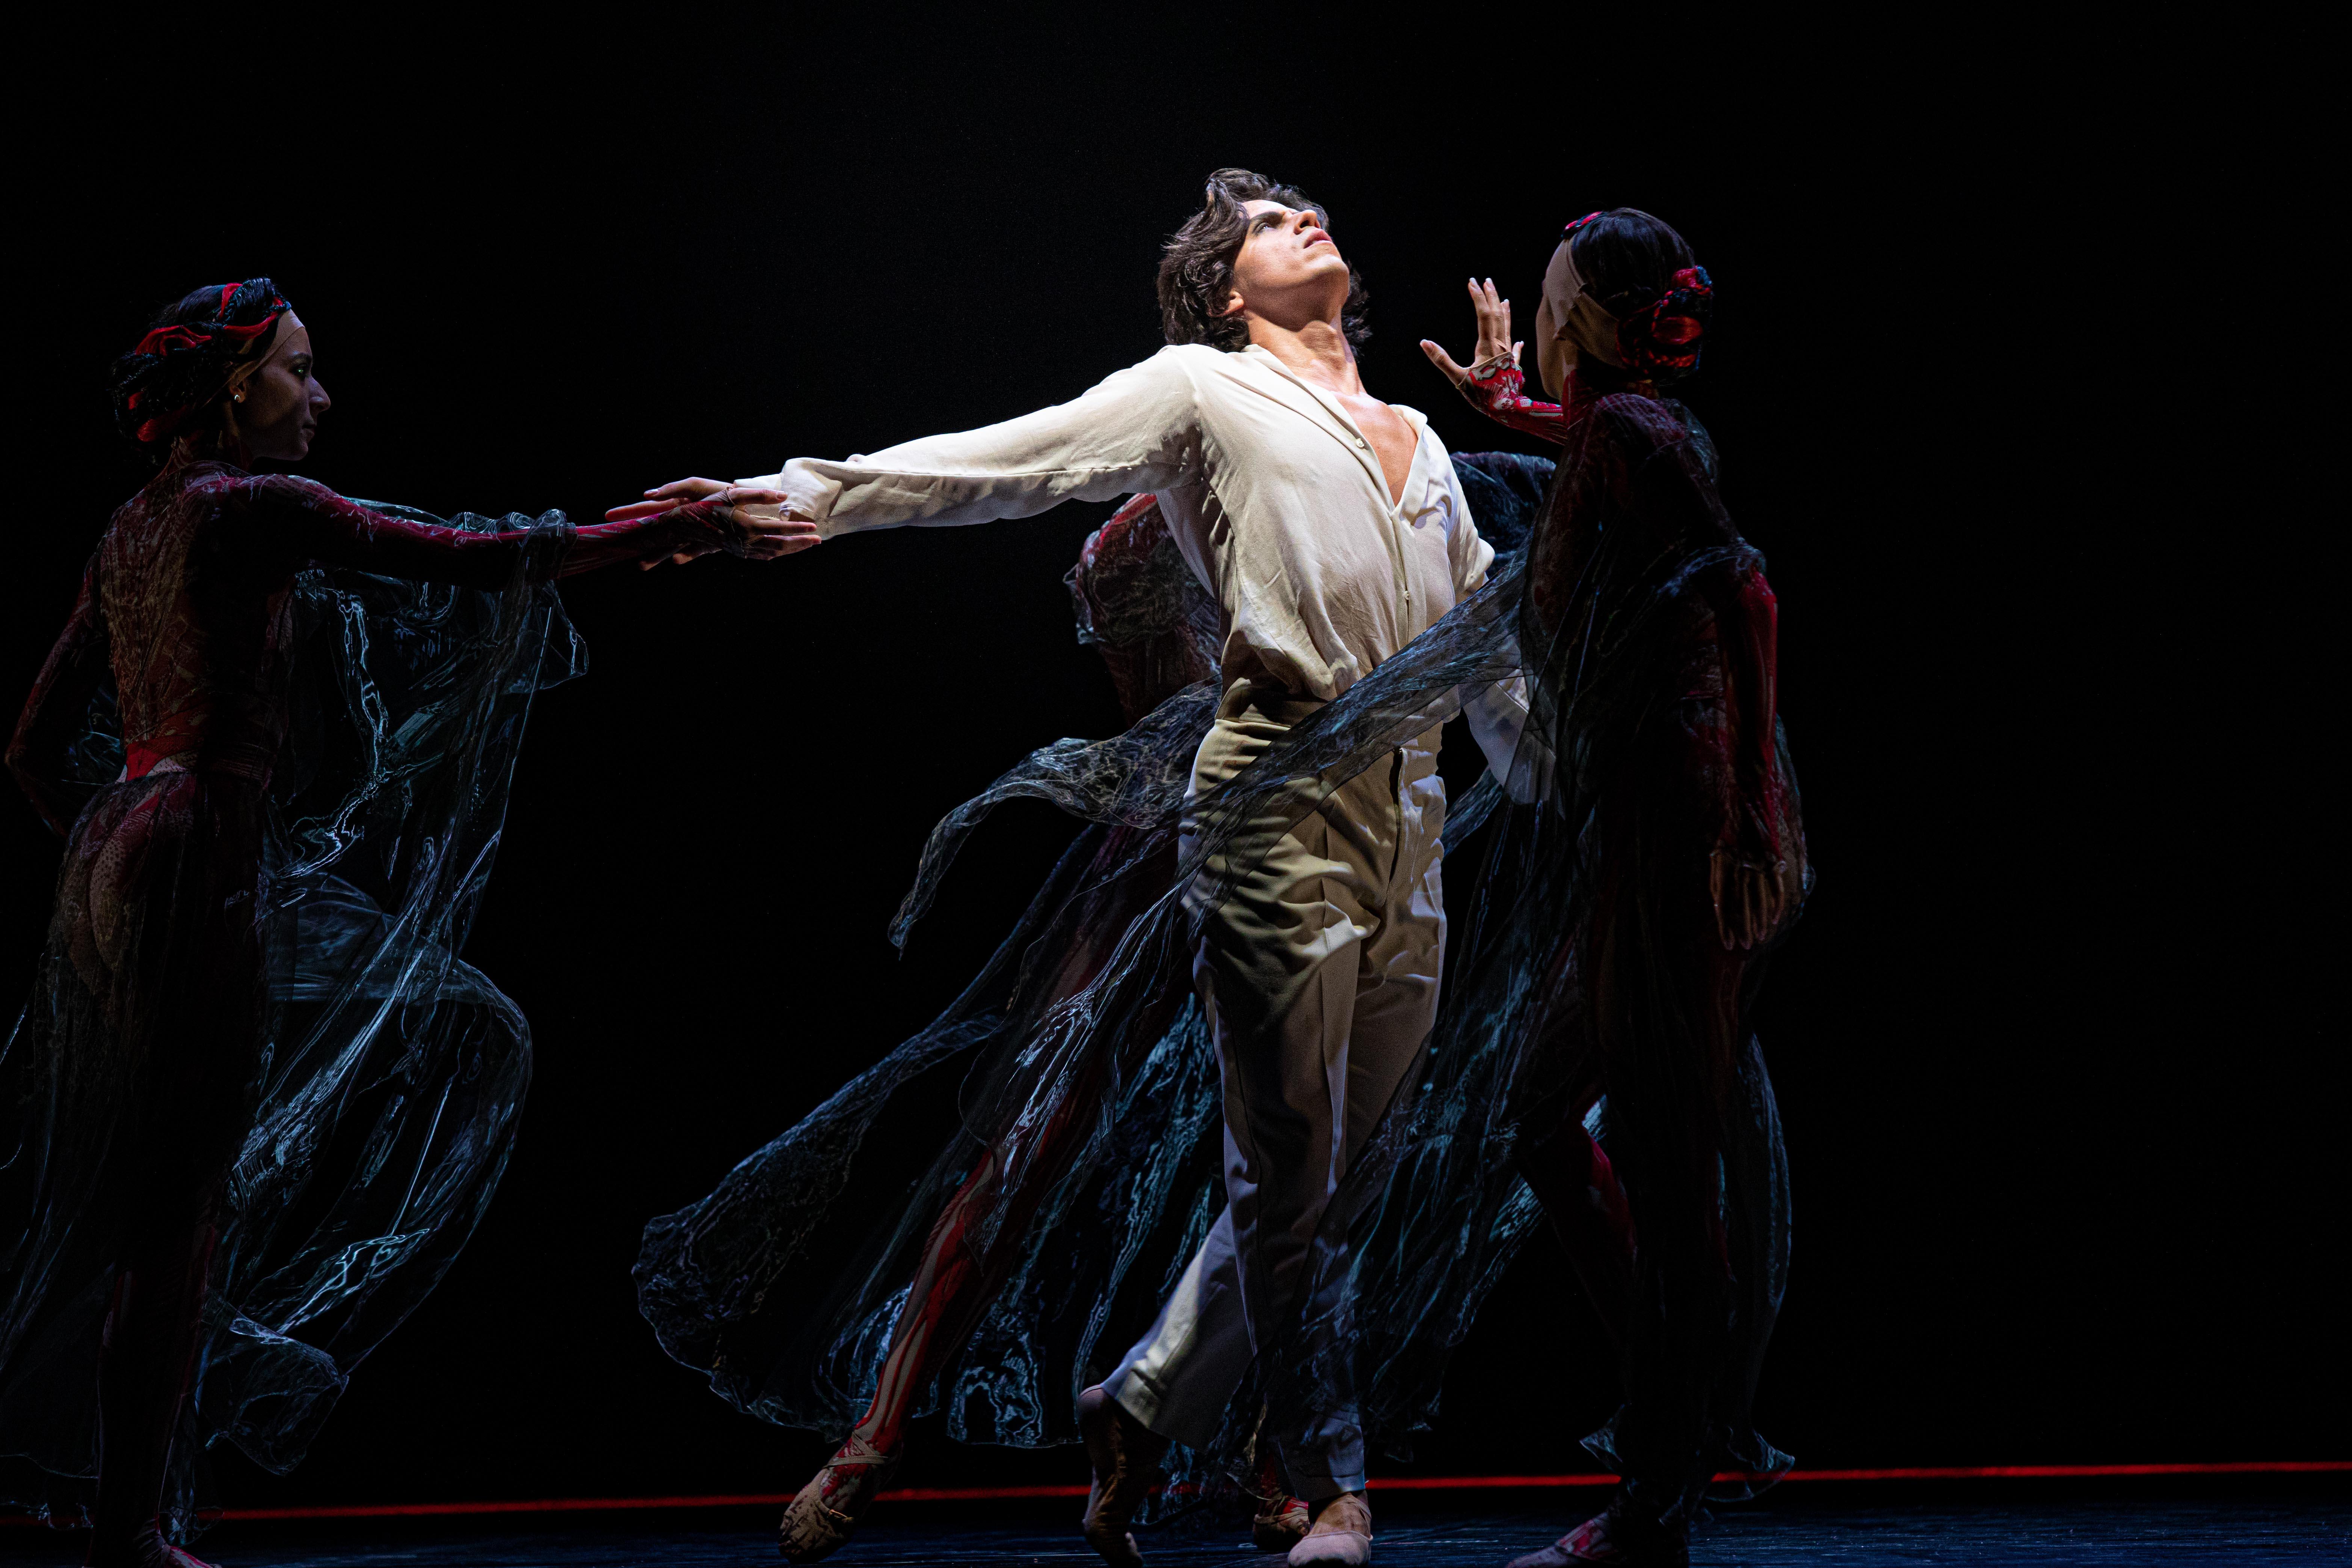 Ballett-Dortmund_PURGATPRIO_Javier-Cacheiro-Alemán_Amanda-Vieira_Manuela-Souza_Foto-Maria-Helena-Buckley